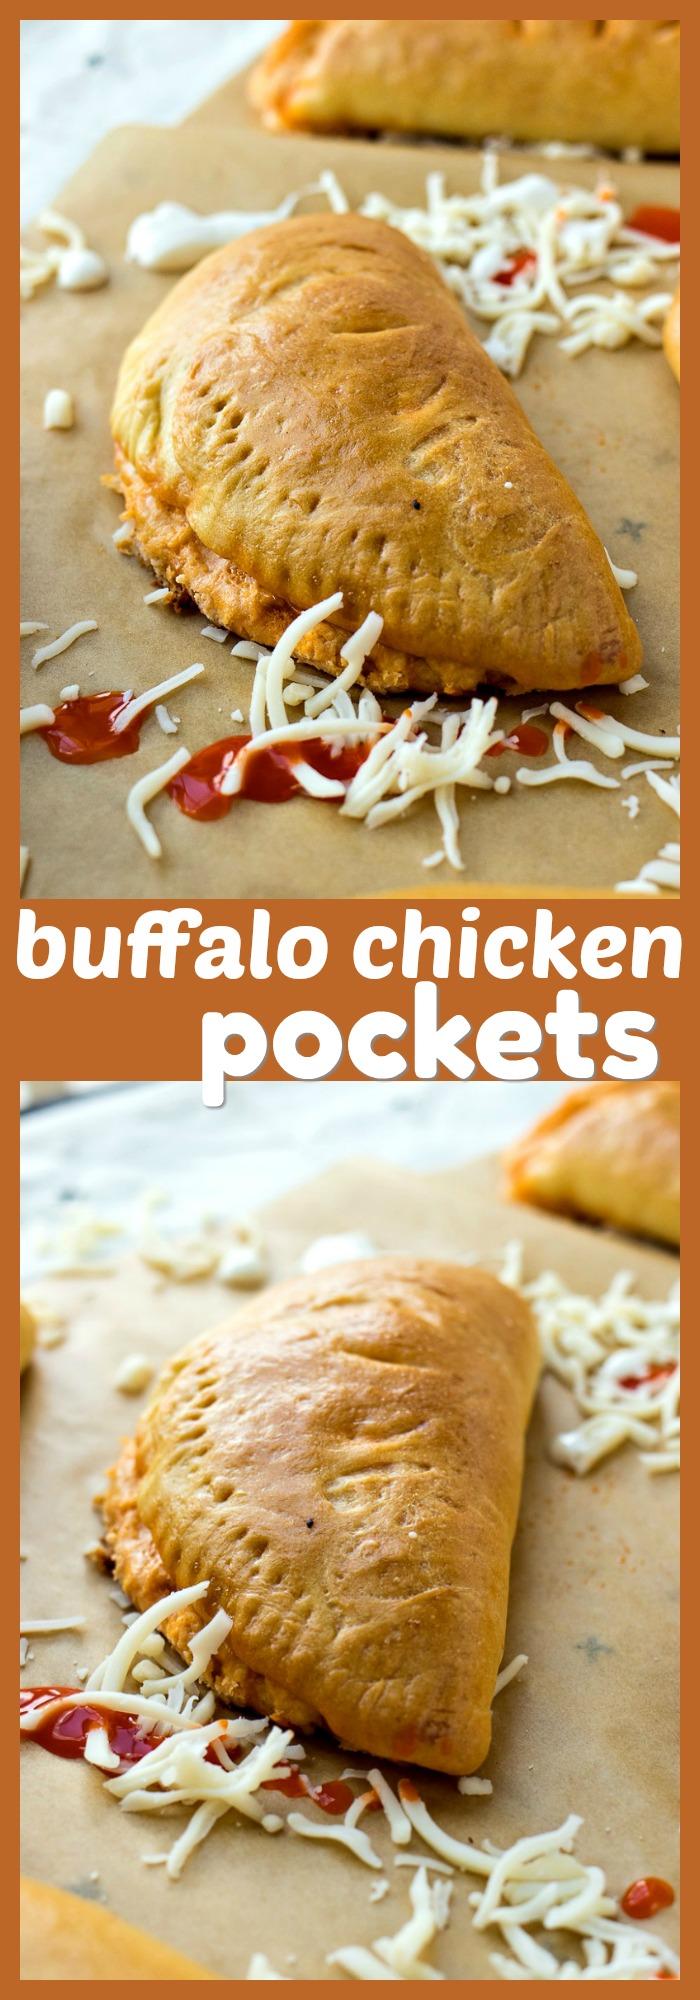 Buffalo Chicken Pockets photo collage